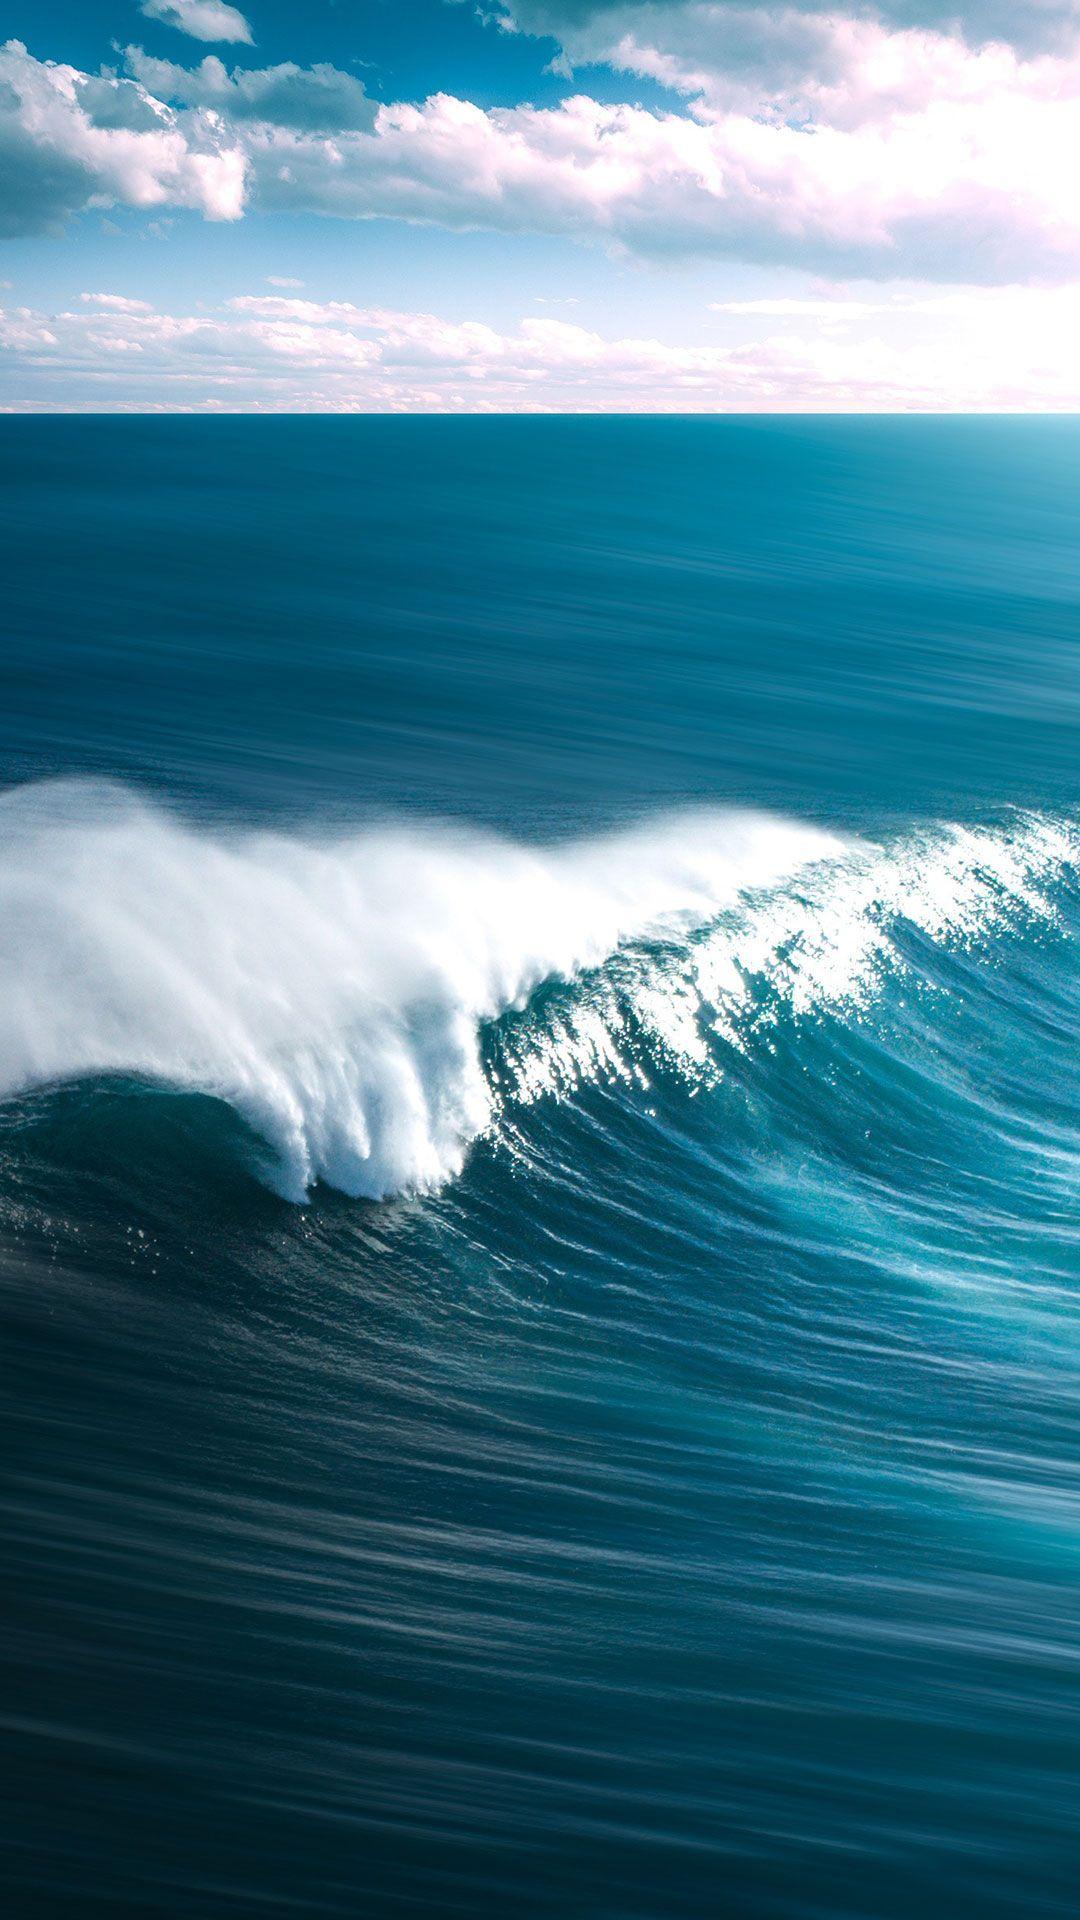 116 Free Beach Wallpapers For Your Phone Desktop Ocean Waves